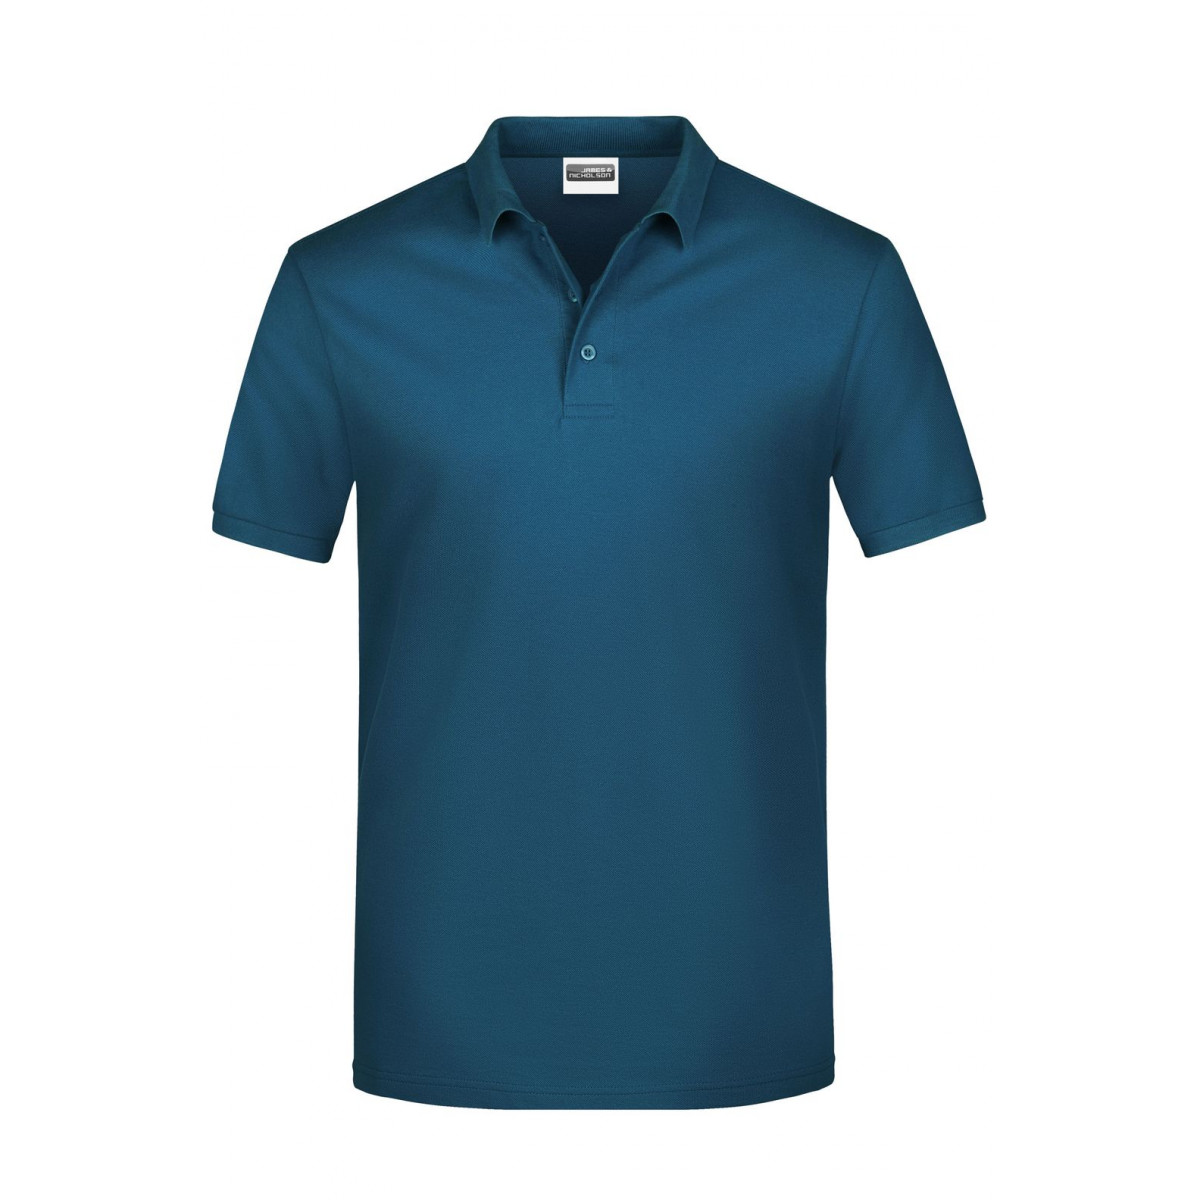 Рубашка поло мужская JN792 Basic Polo Man - Петрол